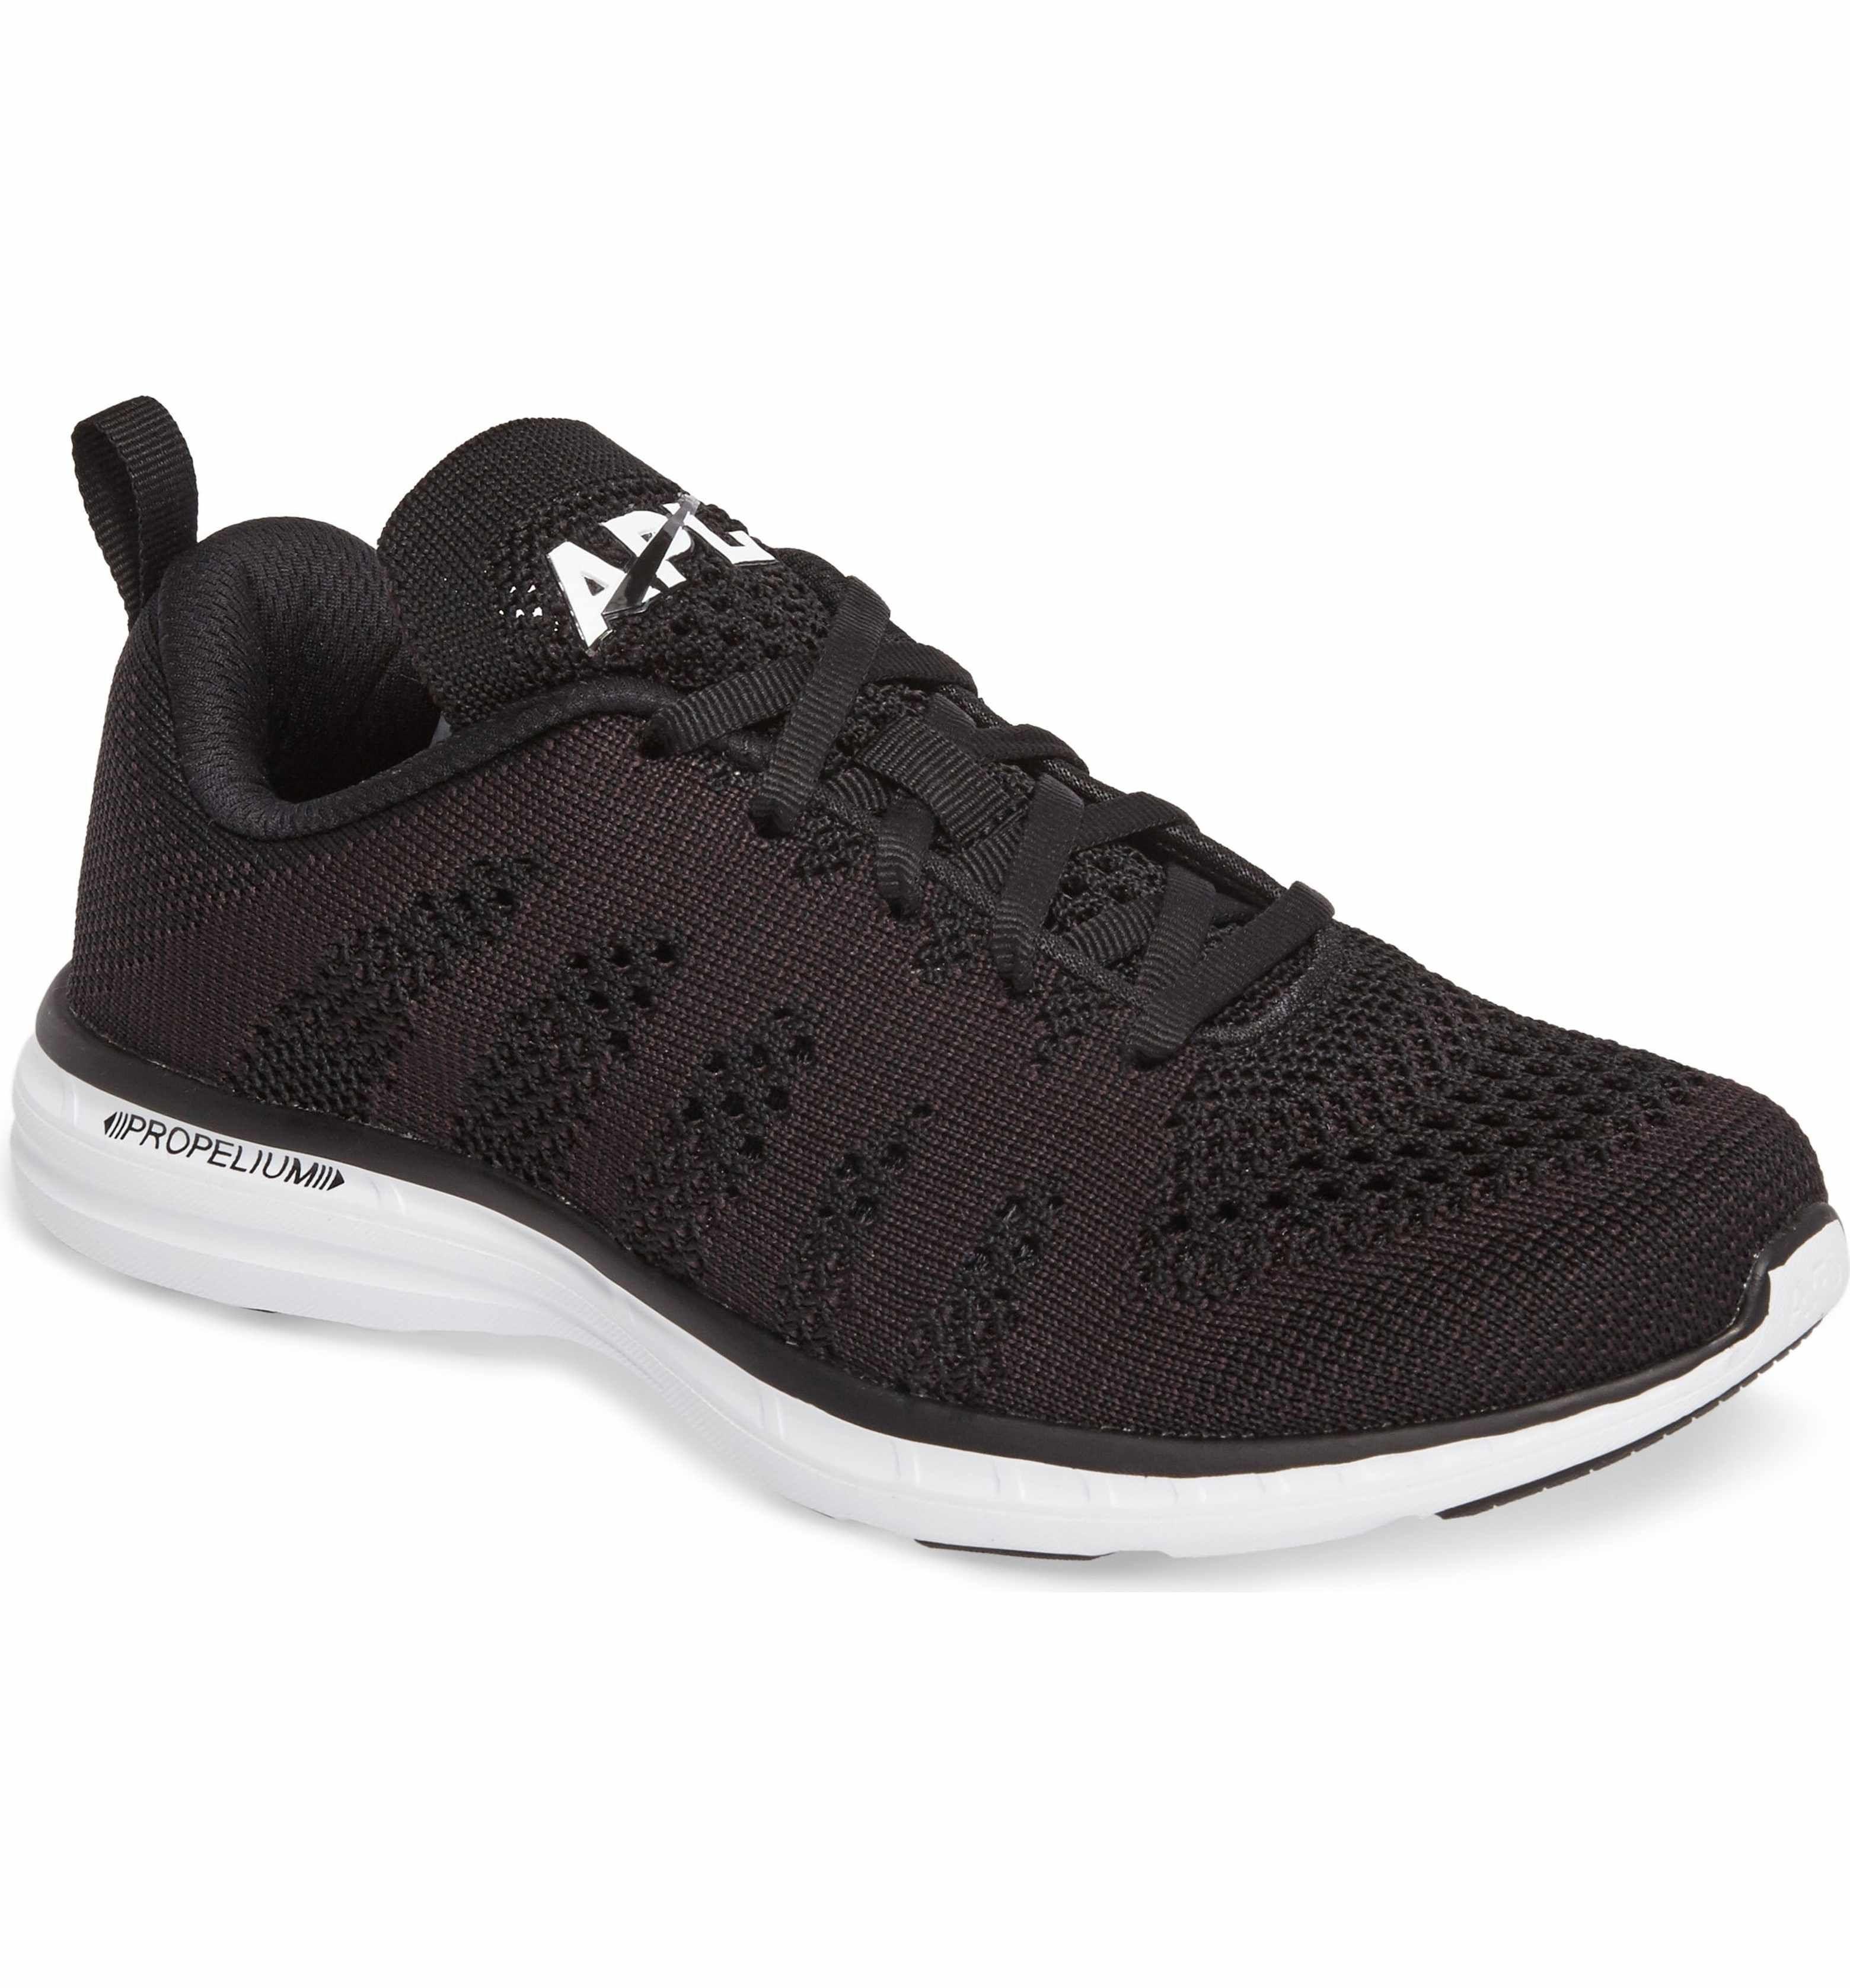 APL TechLoom Pro Knit Running Shoe